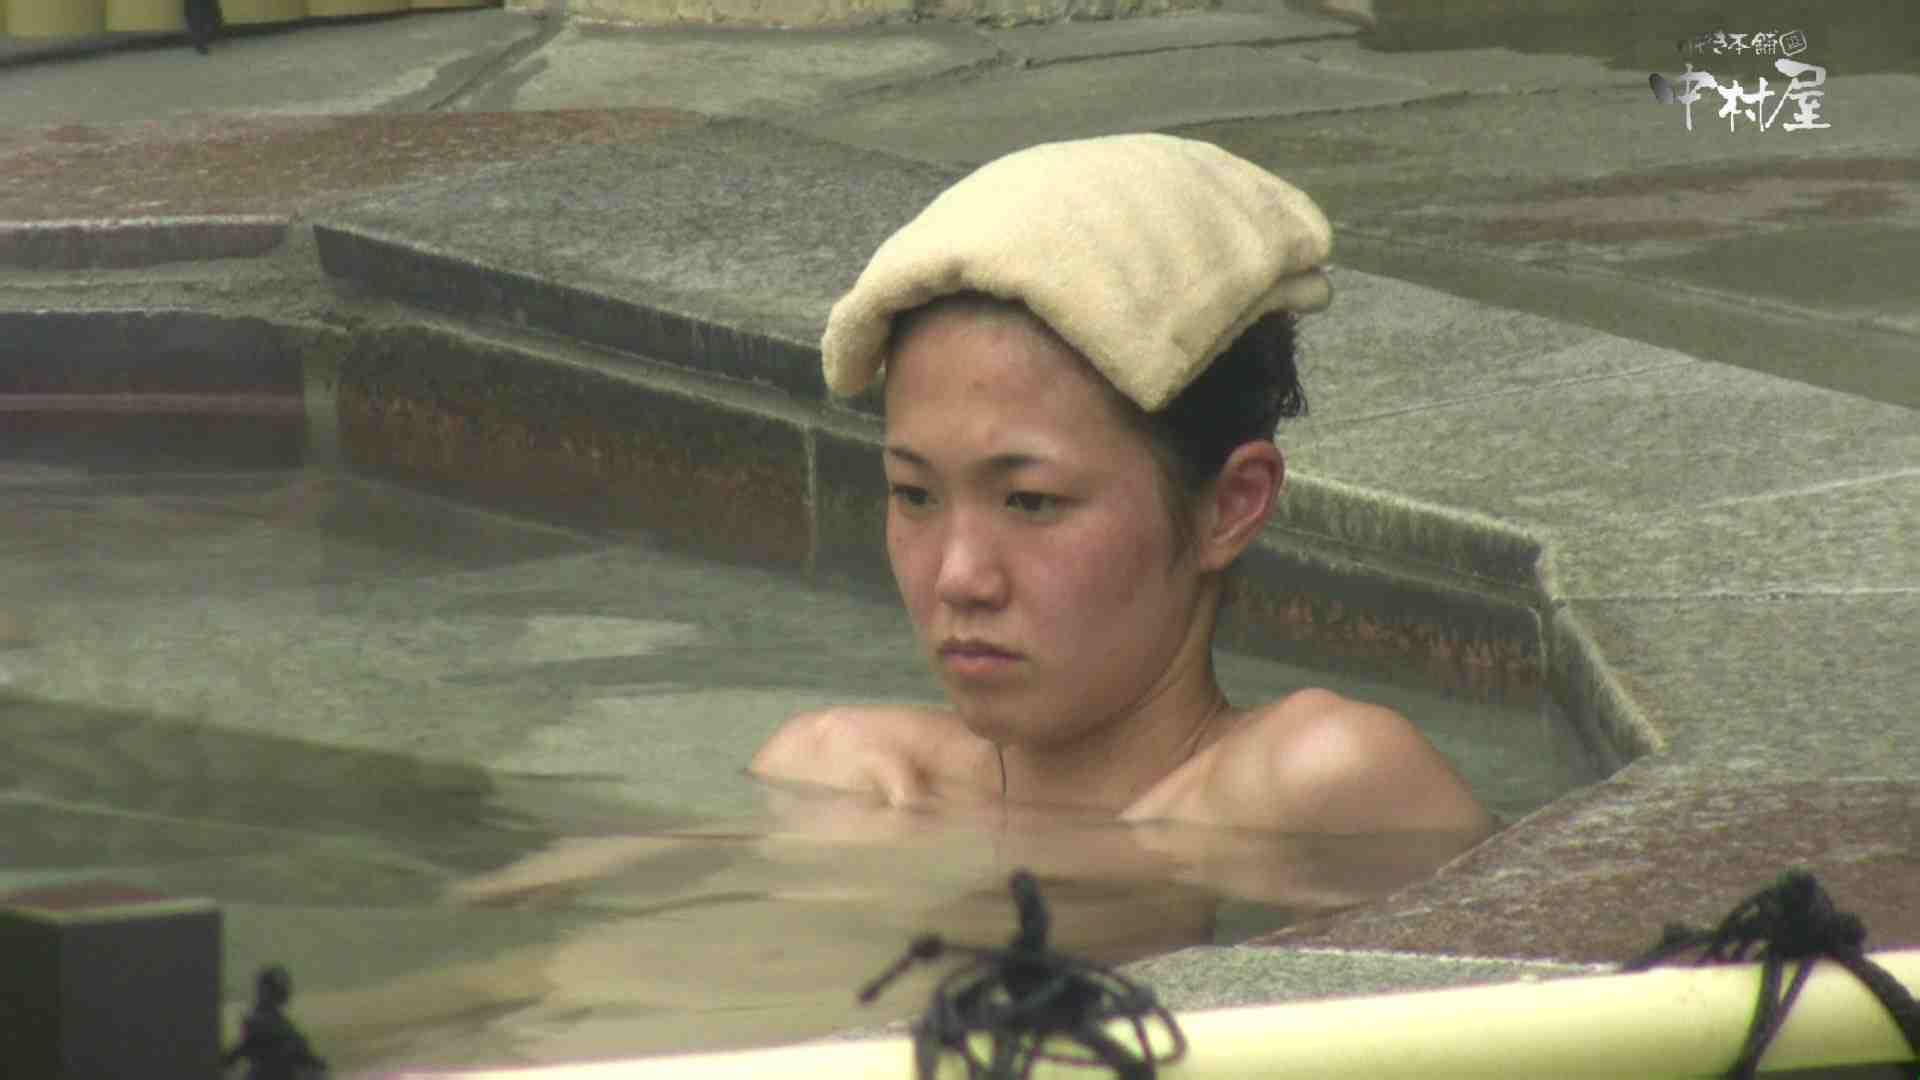 Aquaな露天風呂Vol.889 0   0  87連発 7